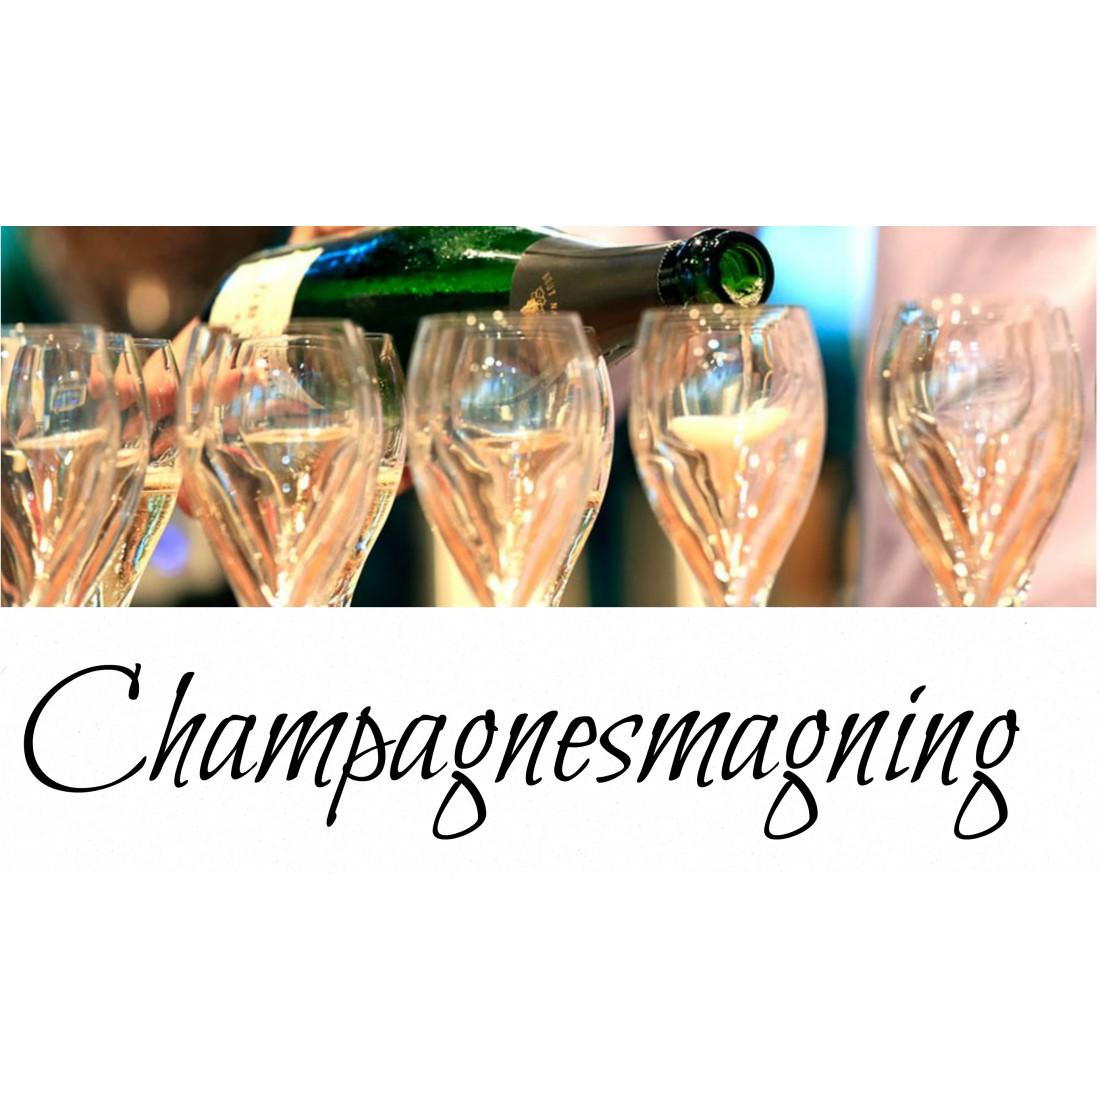 Champagnesmagninglrdagden25septemberkl1900IChampagneKlderen-31